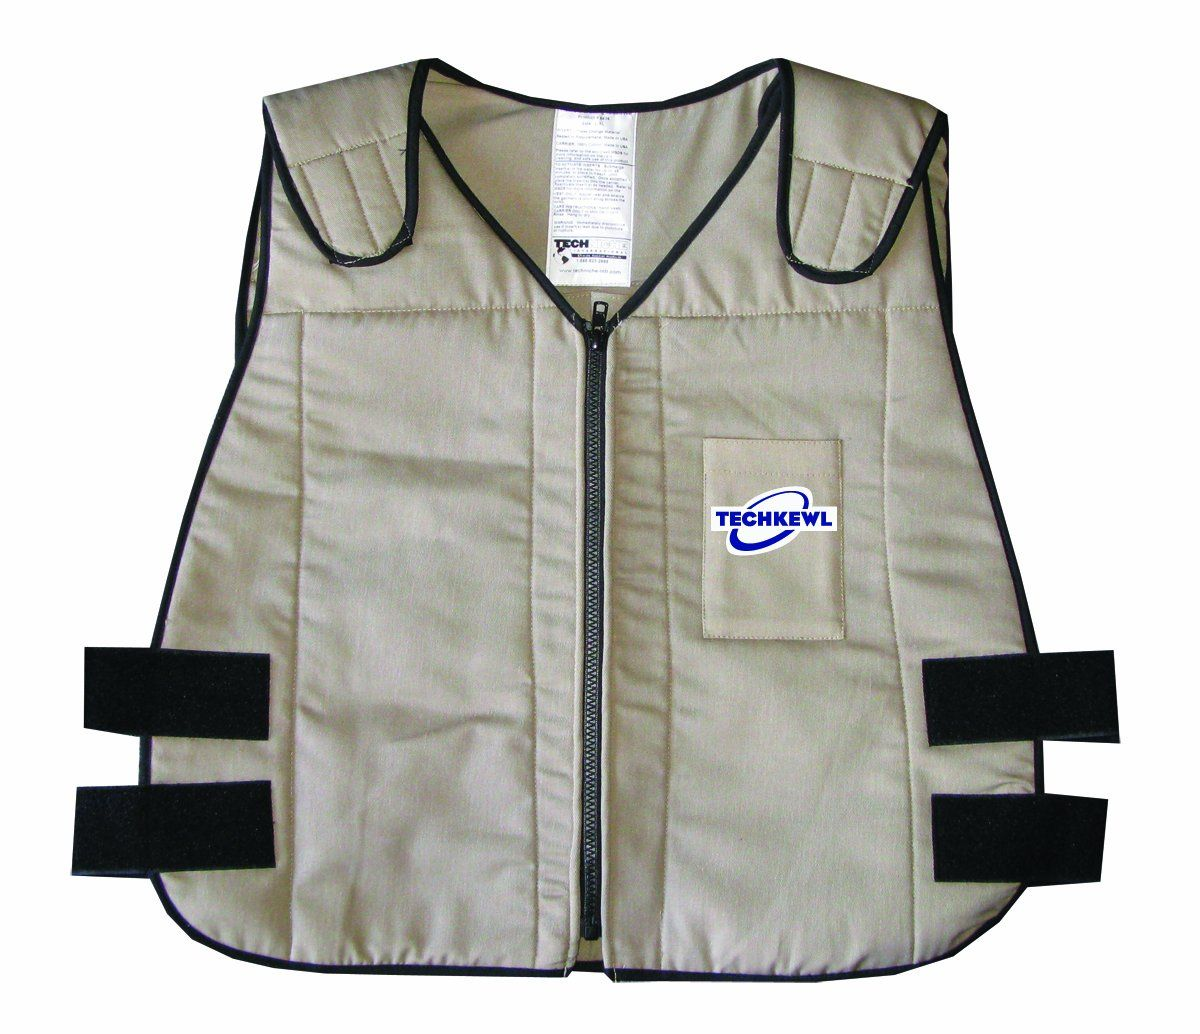 Techkewl 6626 Kh M L Phase Change Cooling Vest With Images